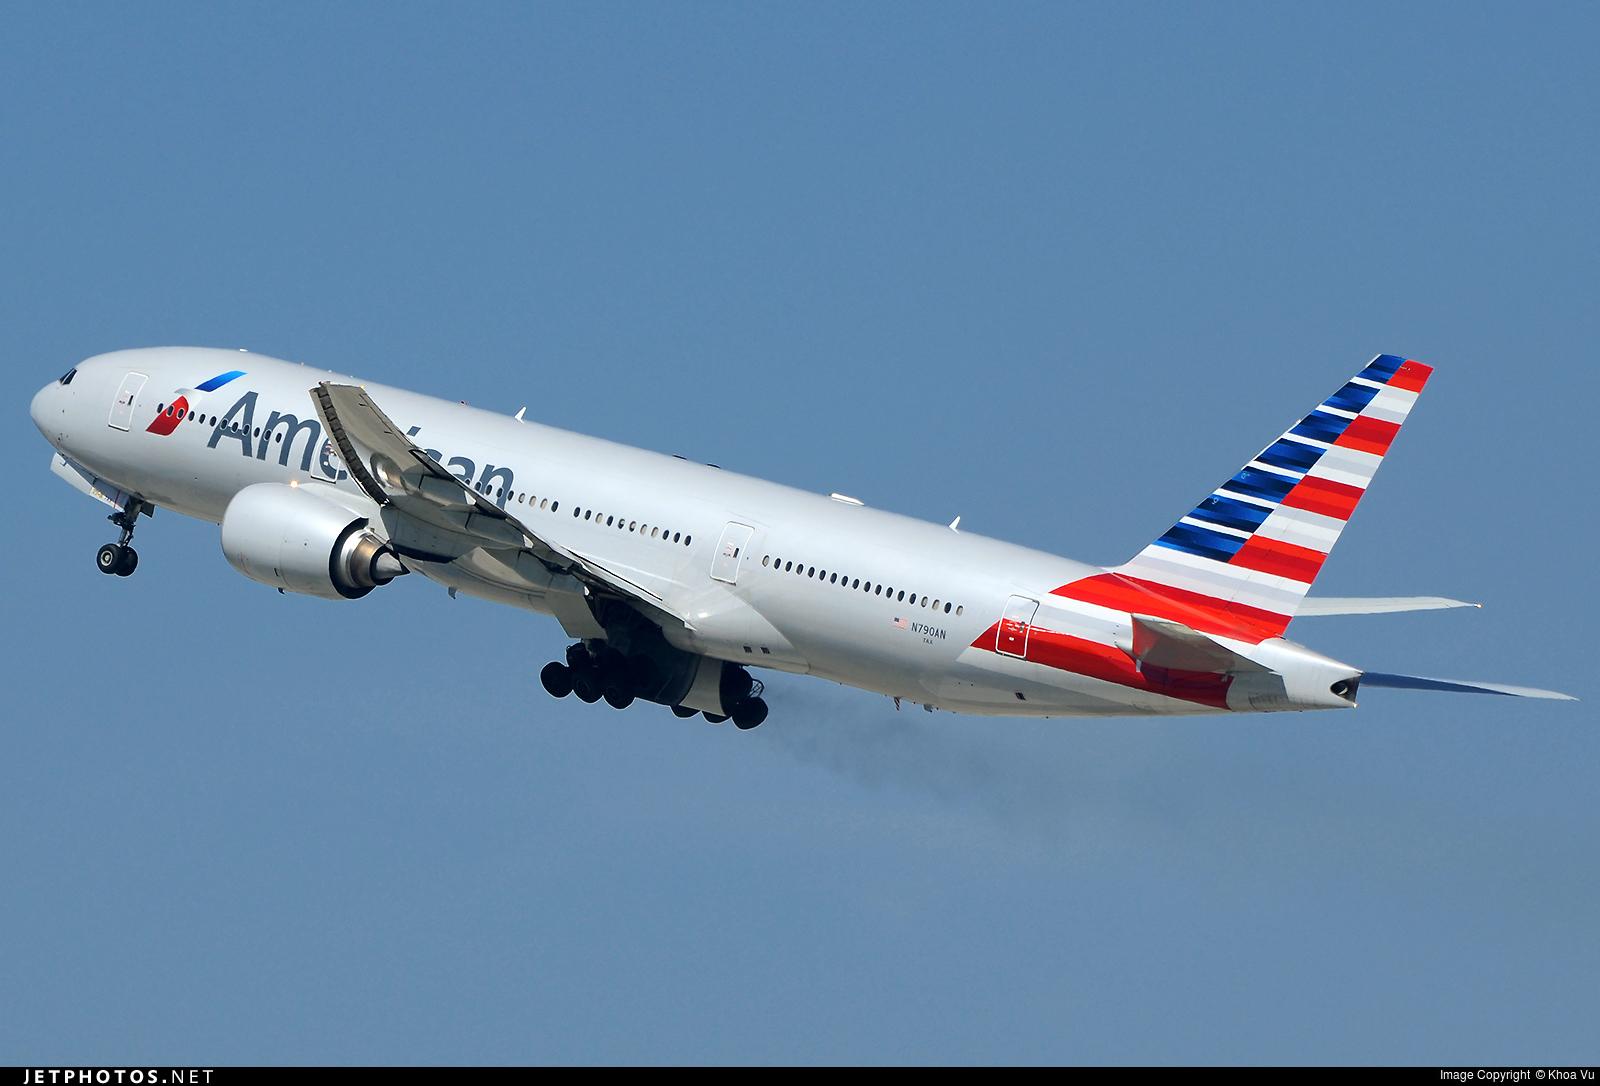 N790an Boeing 777 223 Er American Airlines Khoa Vu